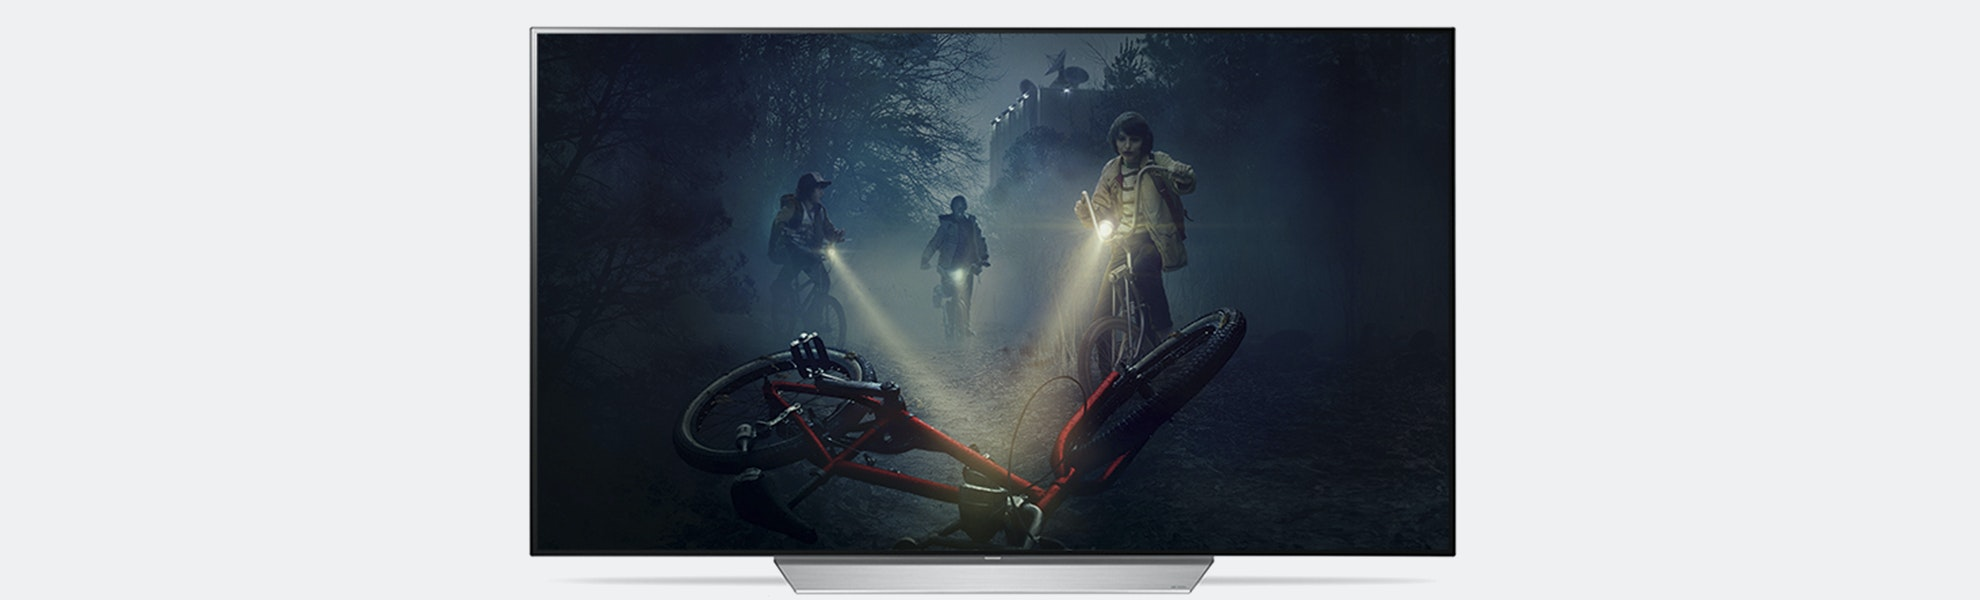 "LG 55"" or 65"" C7P OLED 4K HDR Smart TV"